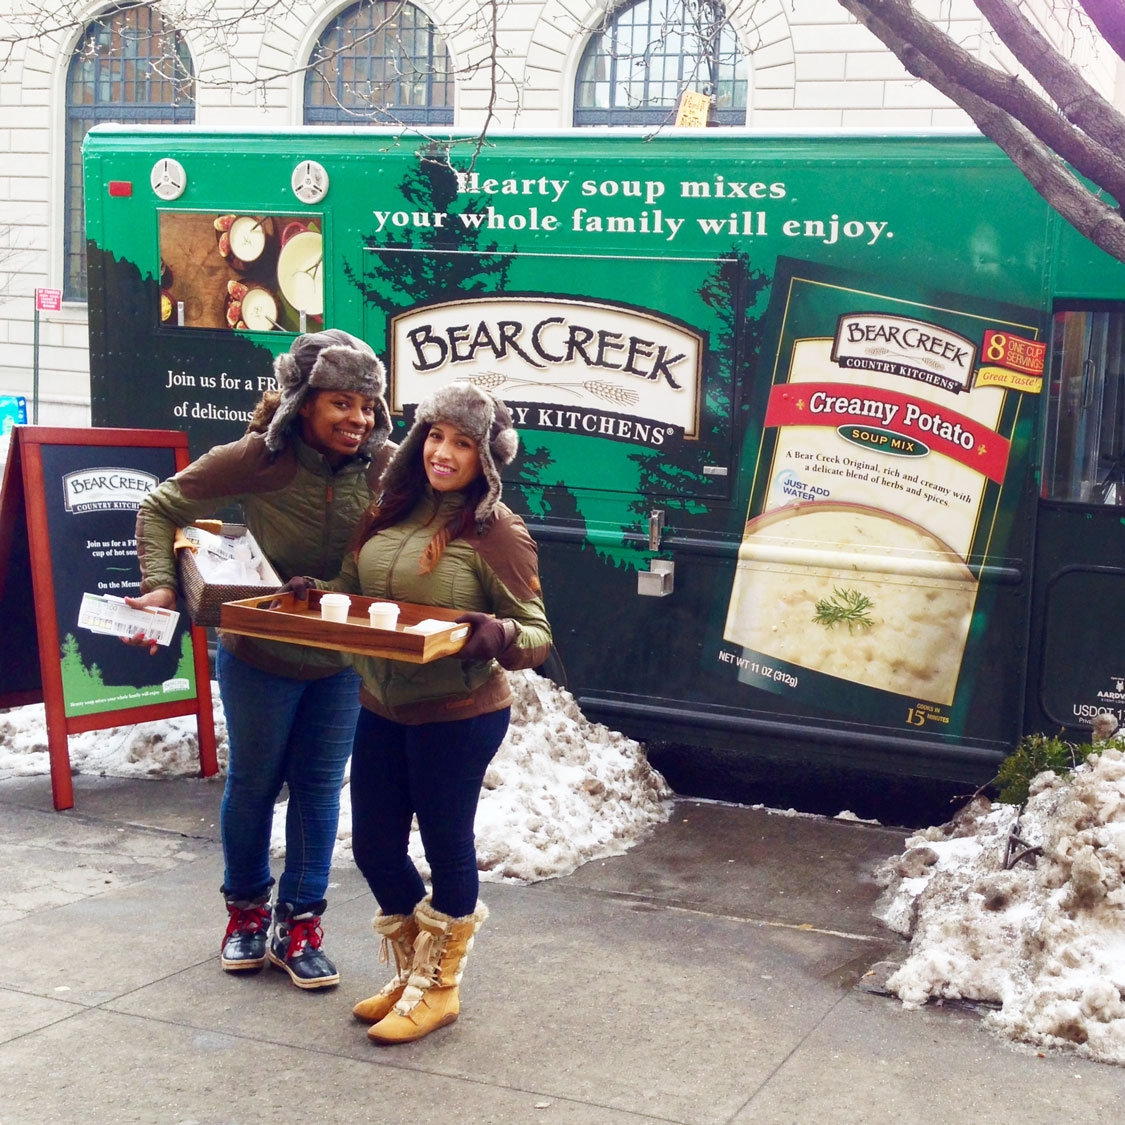 bear-creek-soup-tour-brand-ambassadors.jpg